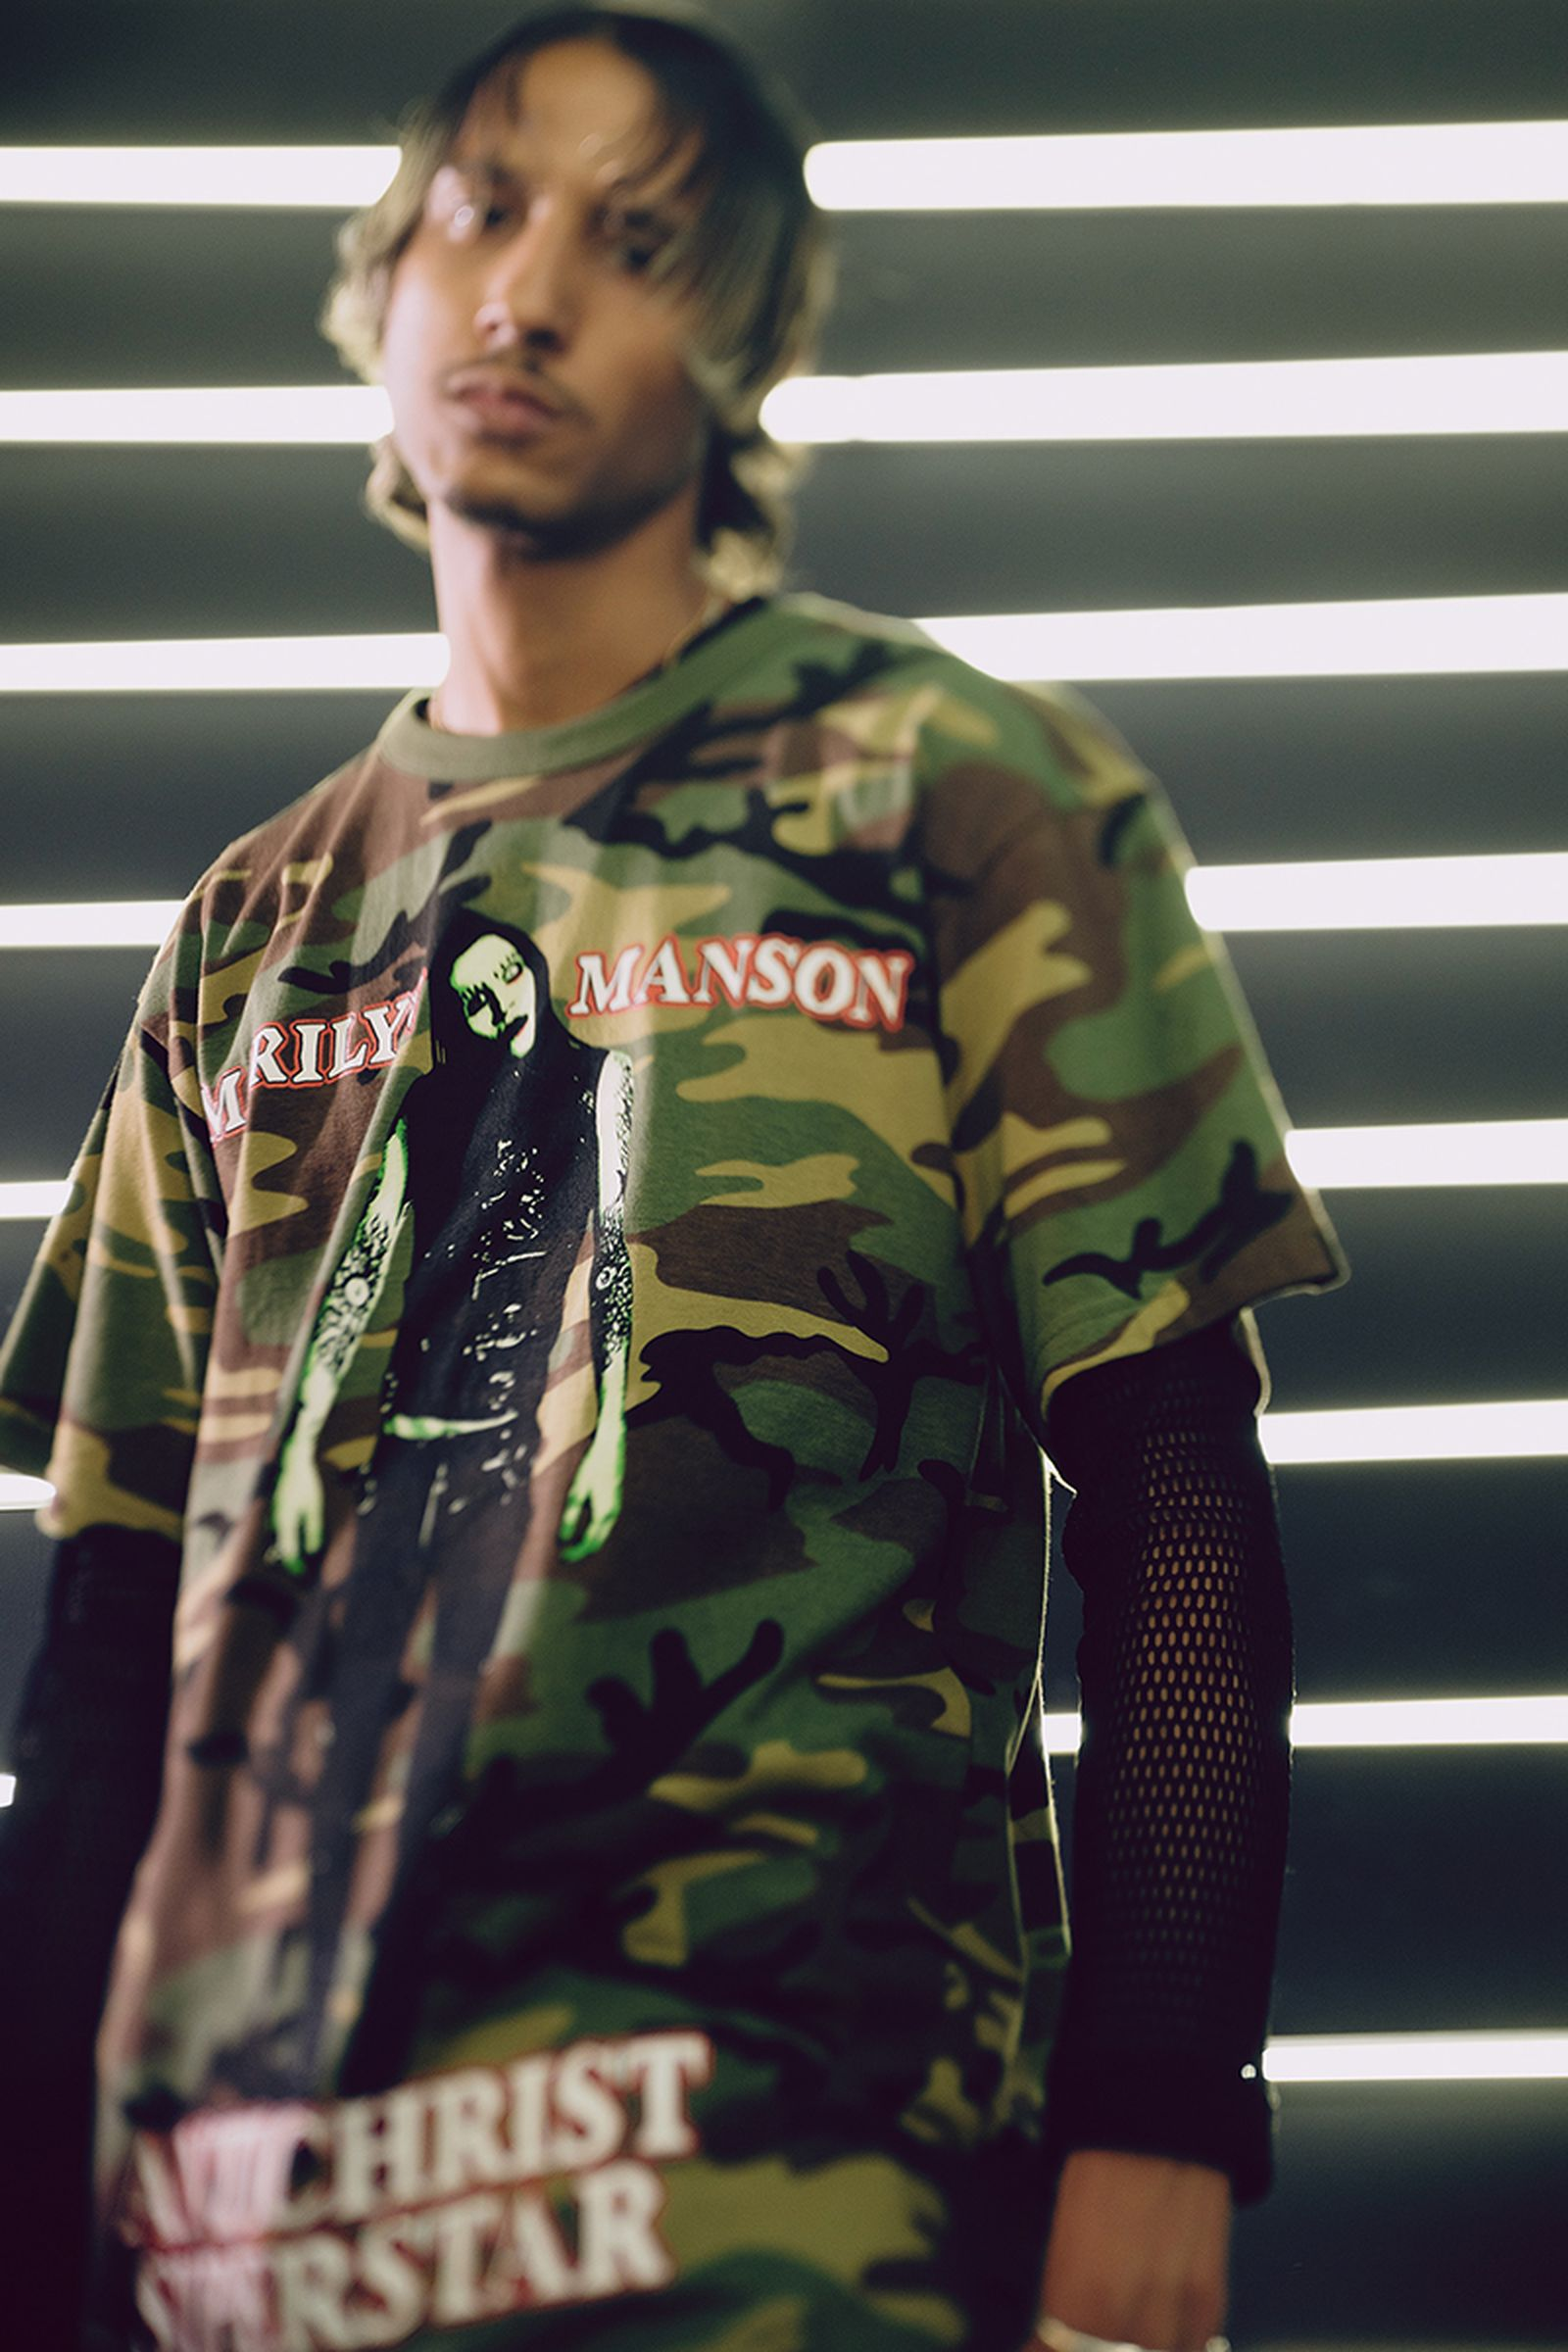 13marilyn-manson-pleasures-collaboration-2020